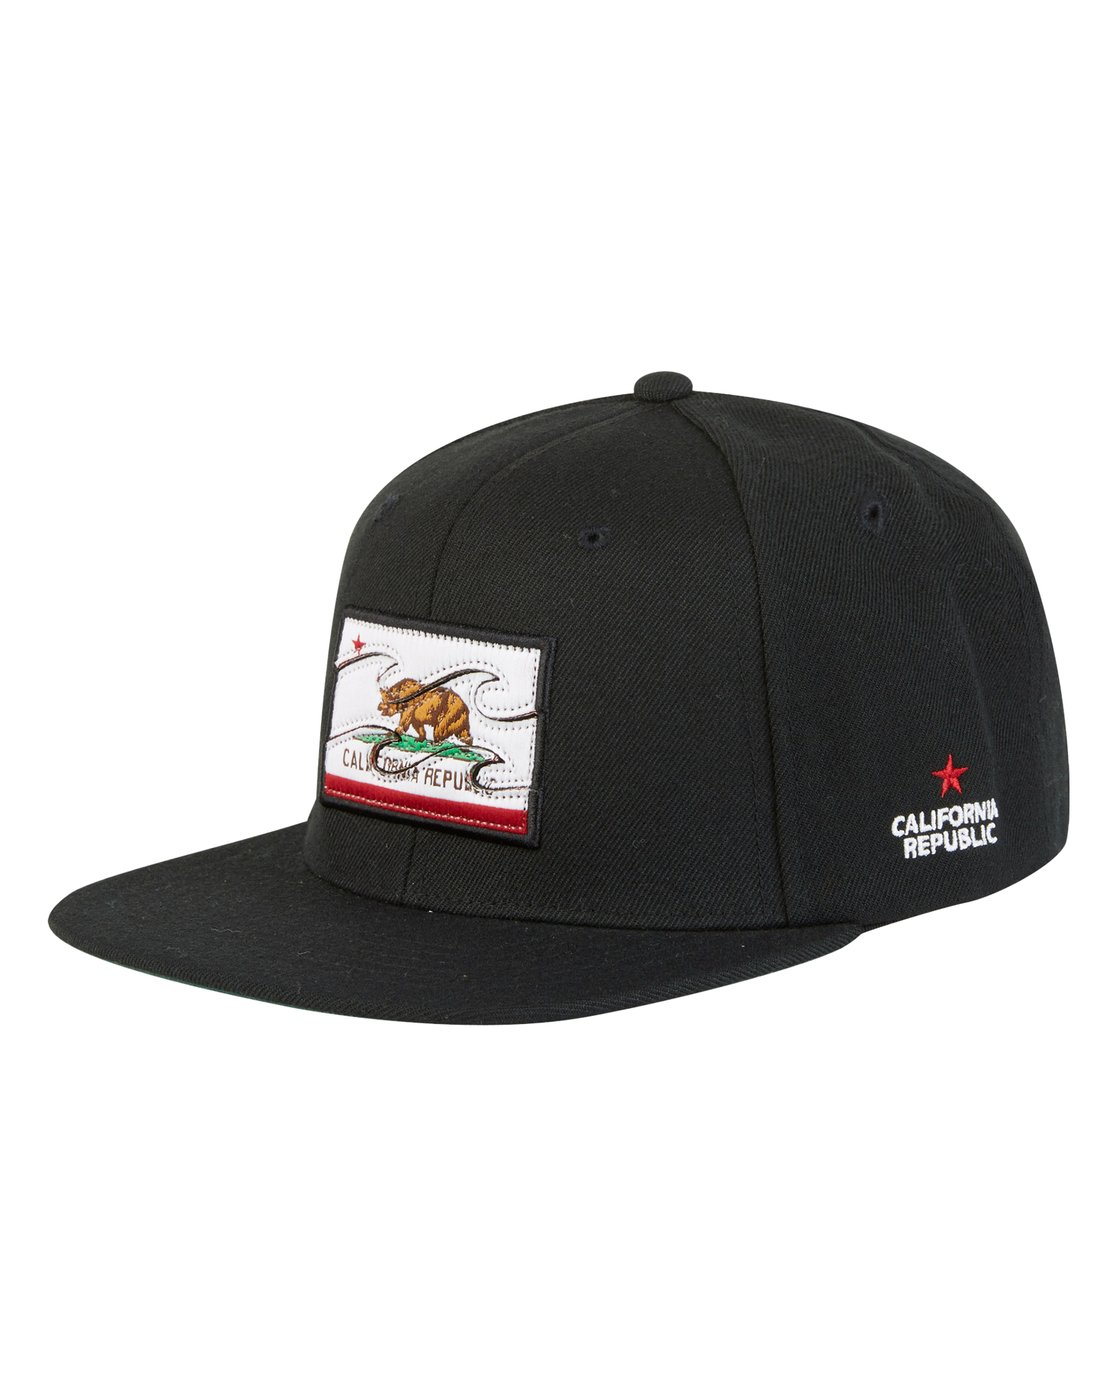 532720ca49b15 0 Native Hat MAHTJNAT Billabong